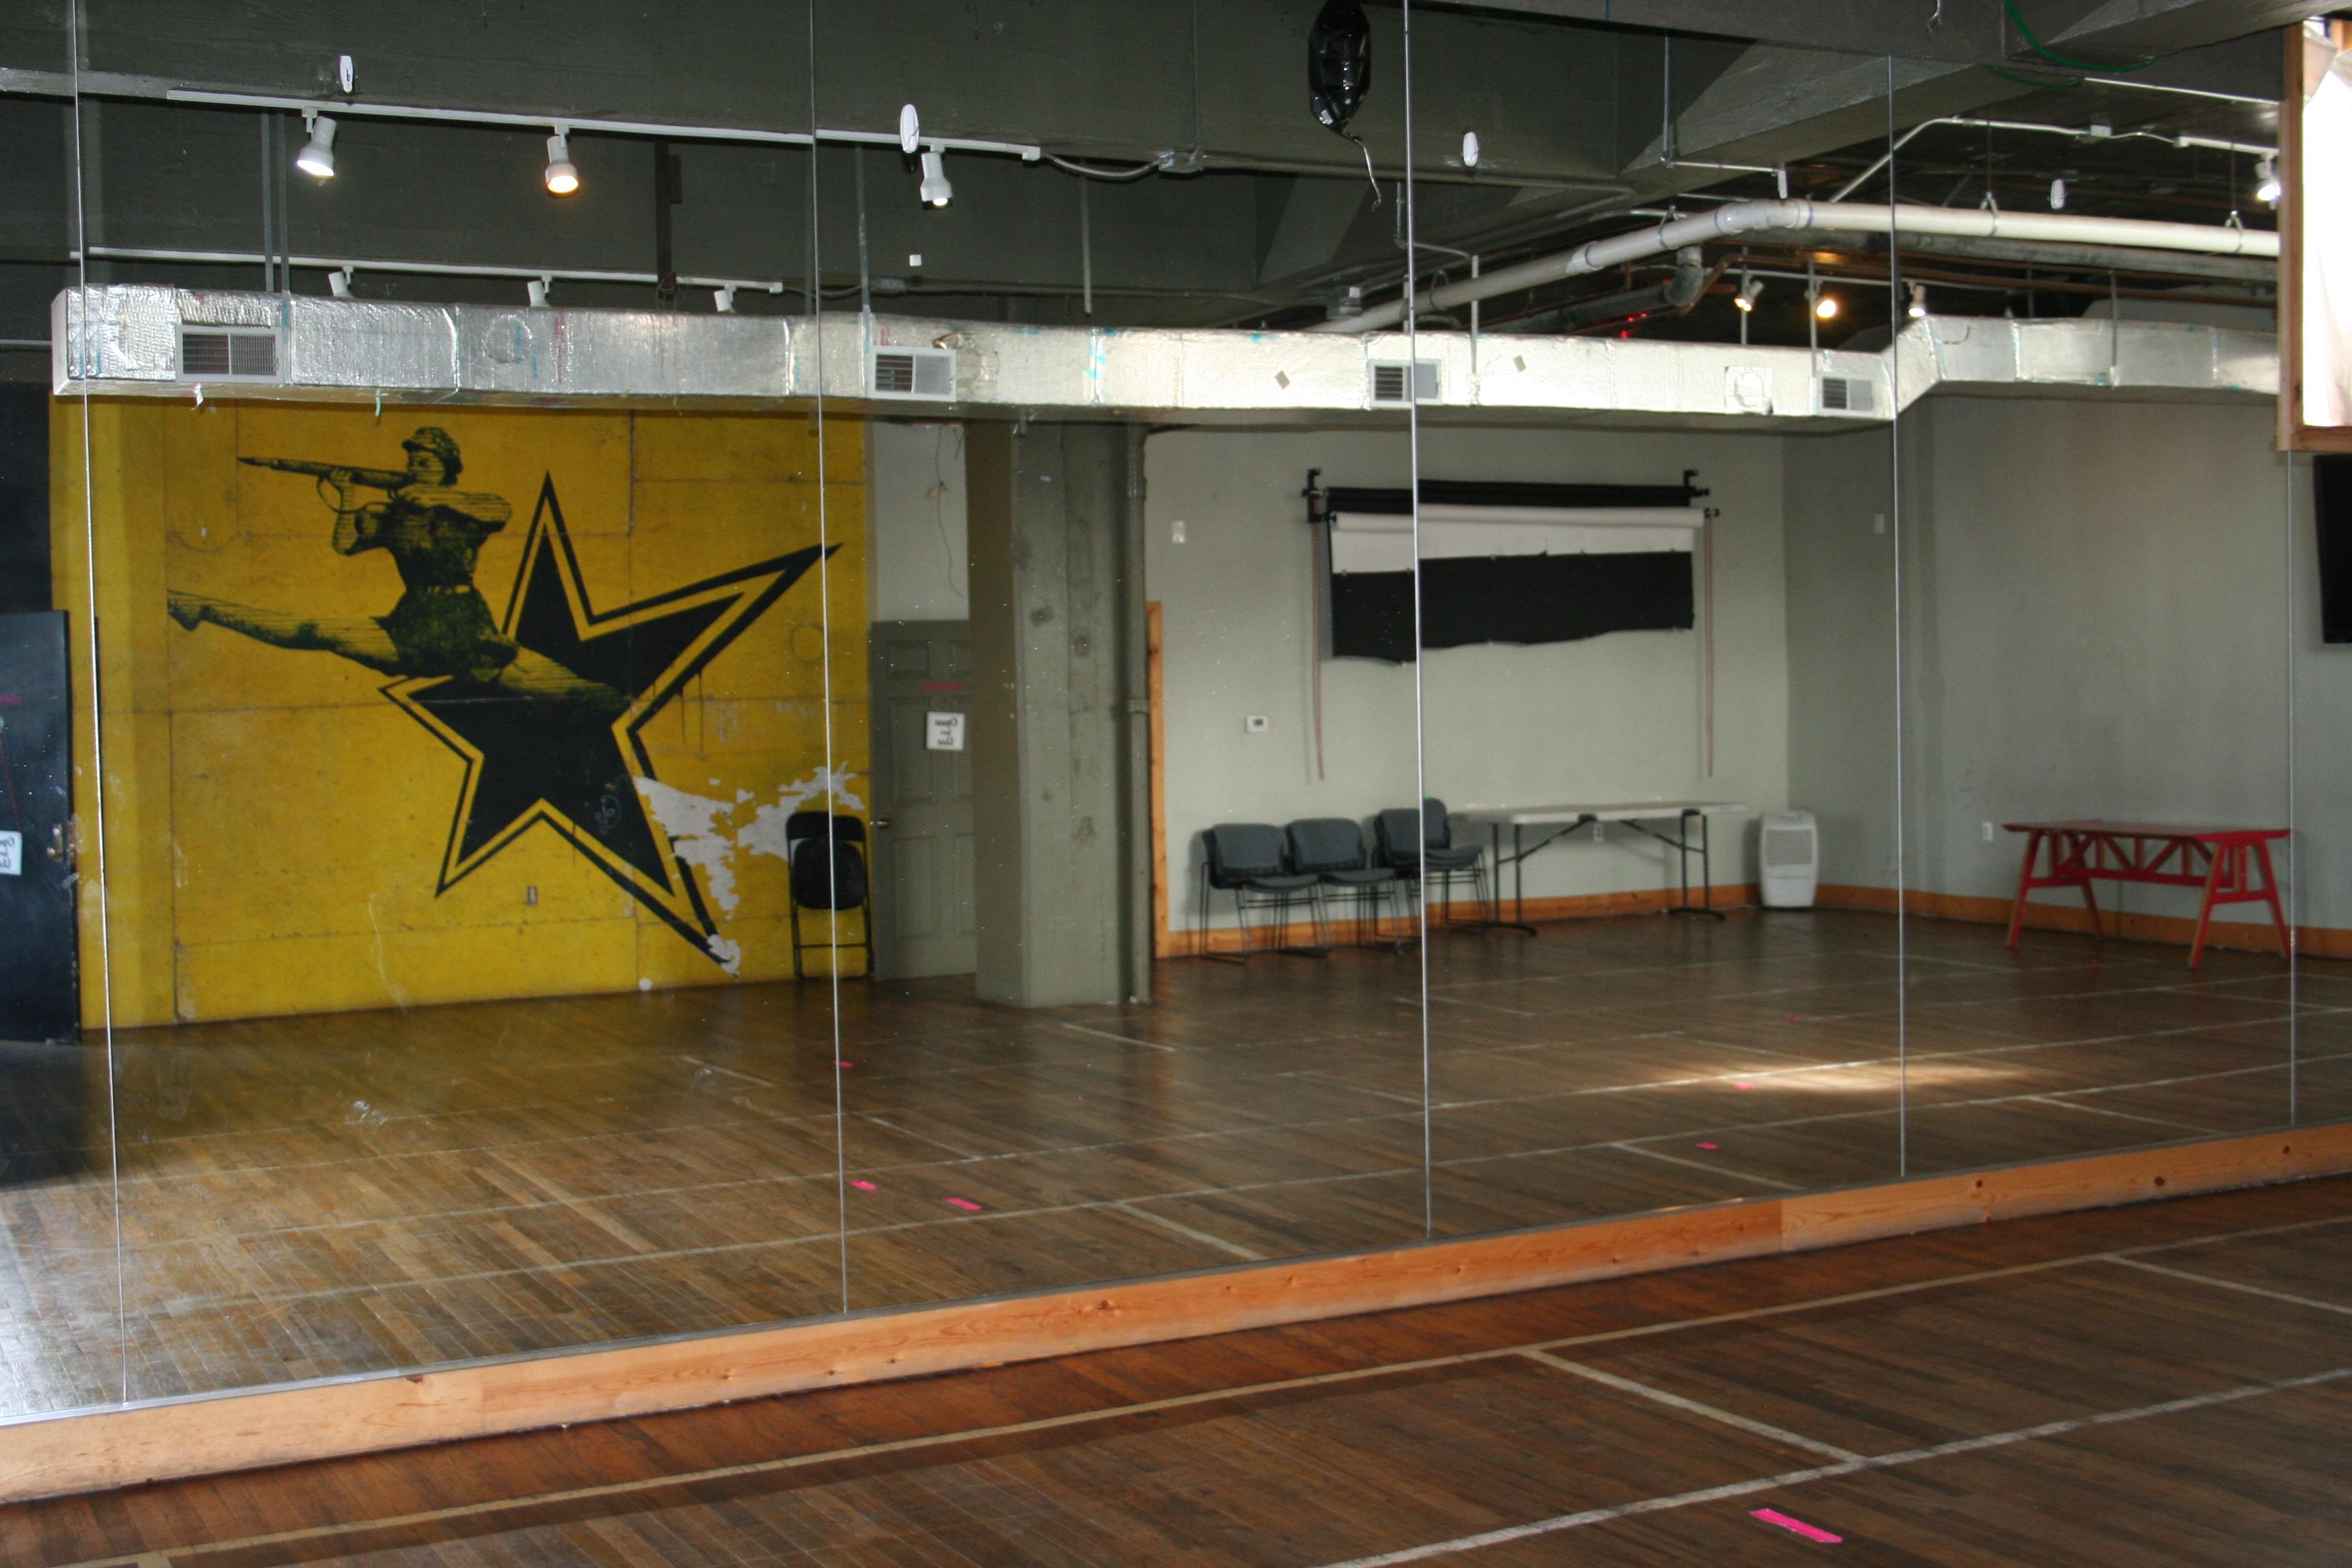 Photograph of Ponyride's dance studio